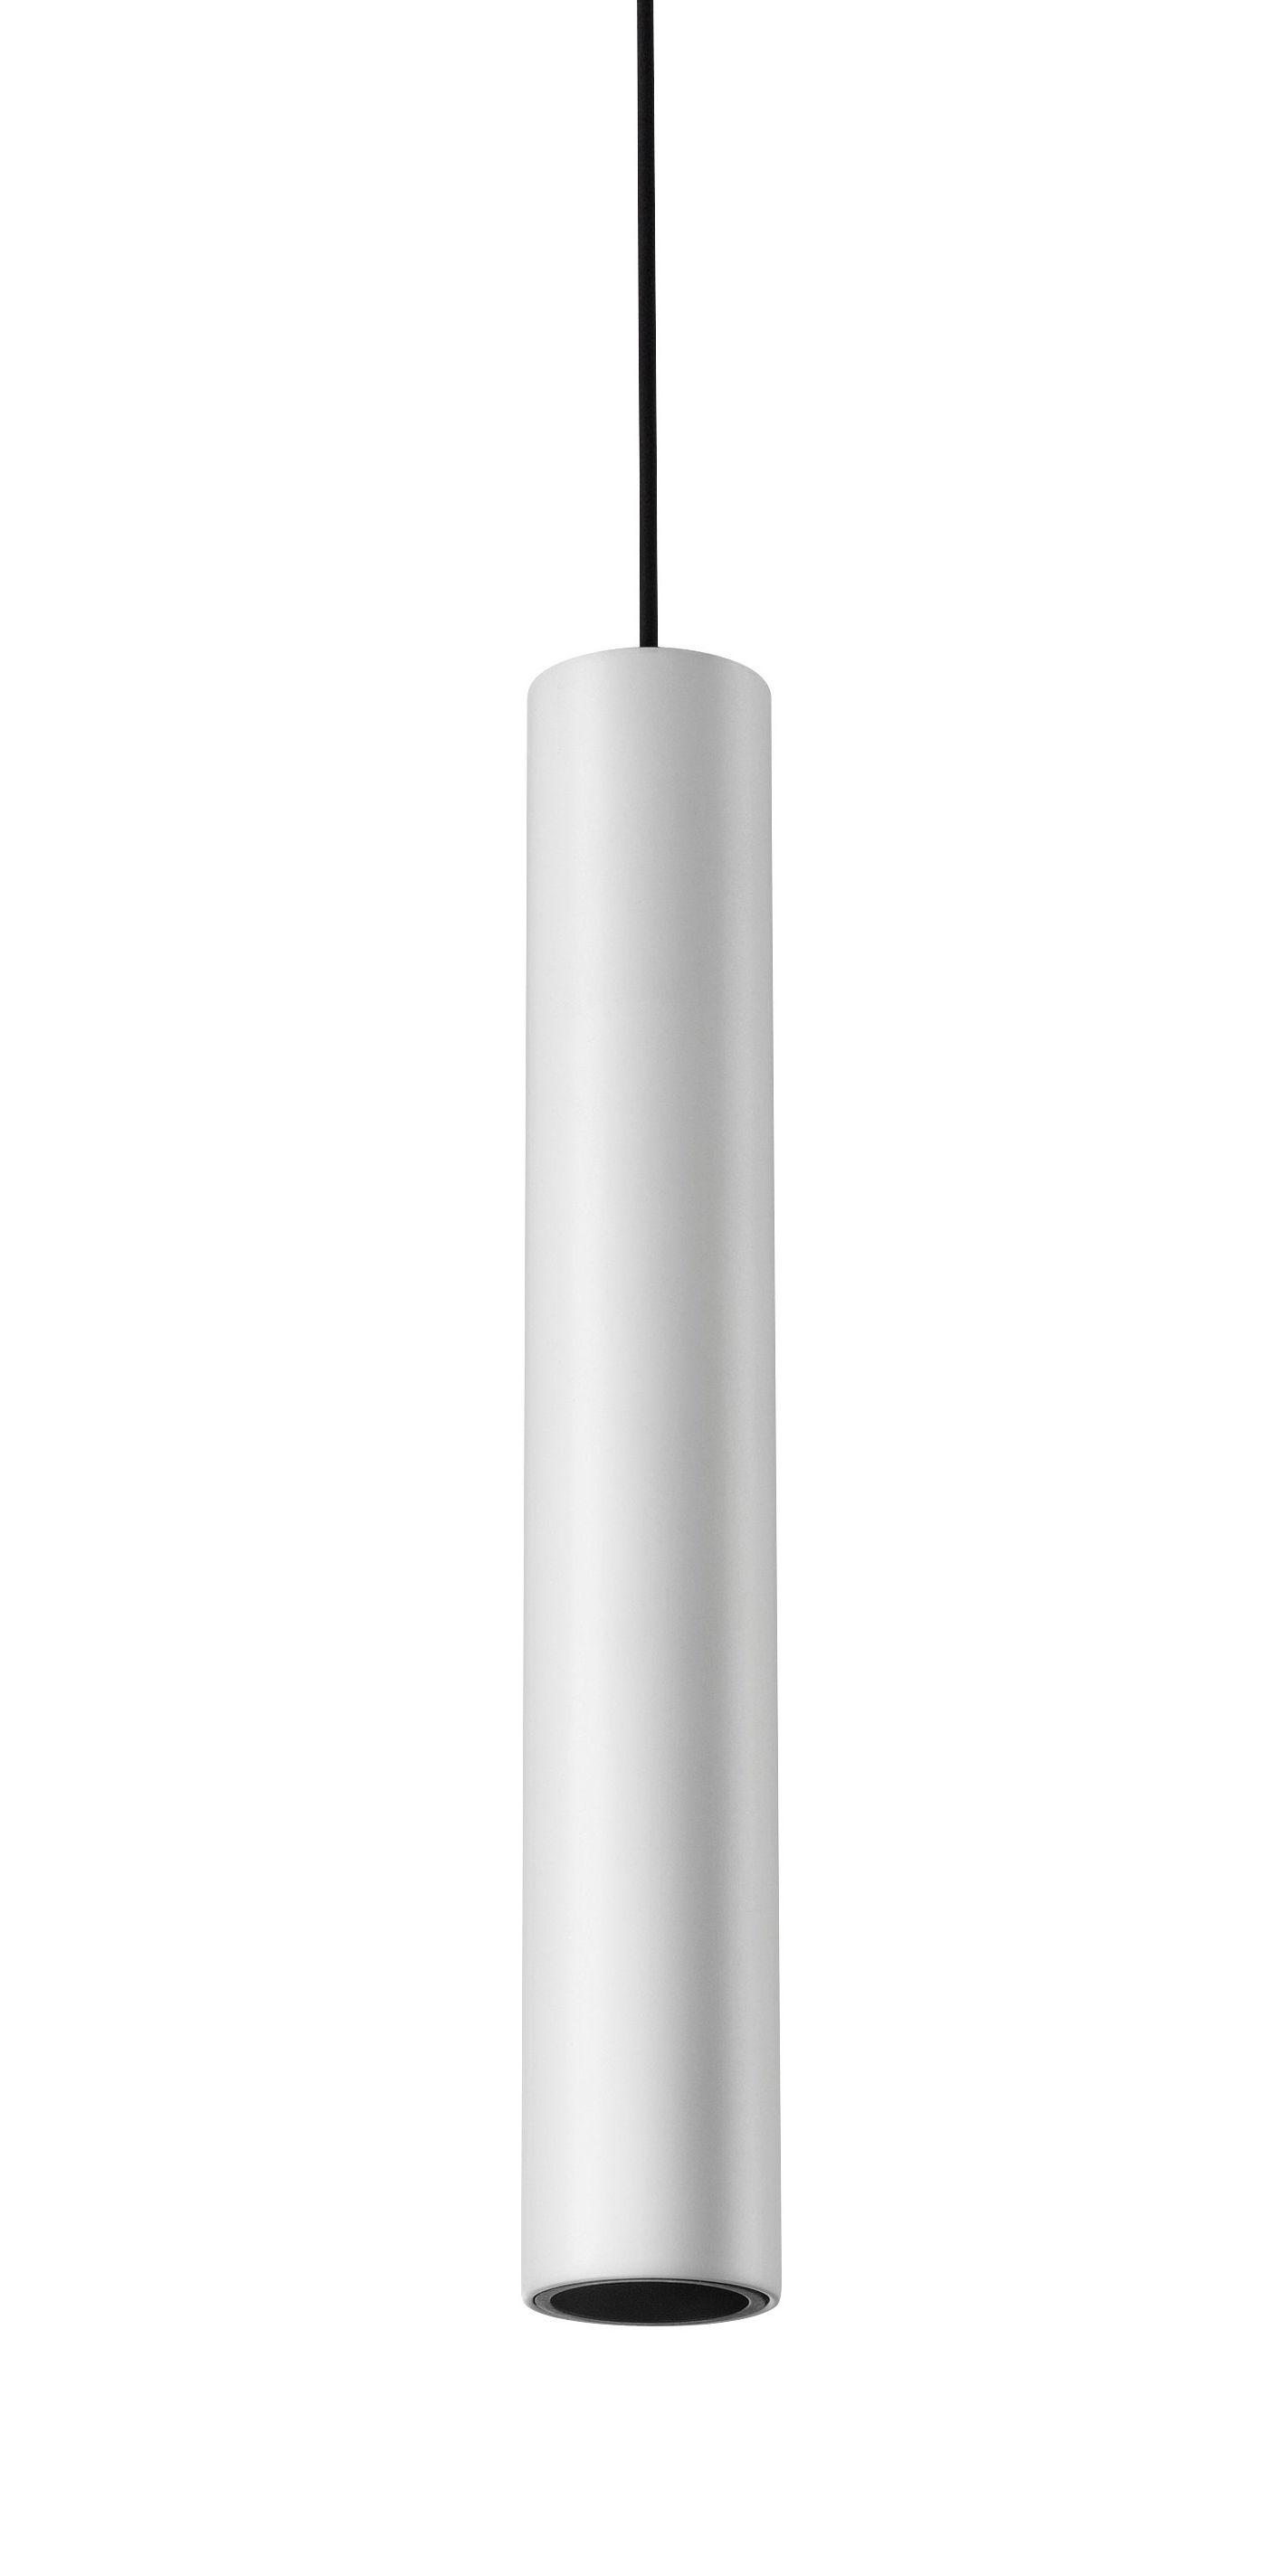 Lighting - Pendant Lighting - Find Me LED Pendant by Flos - White - Aluminium